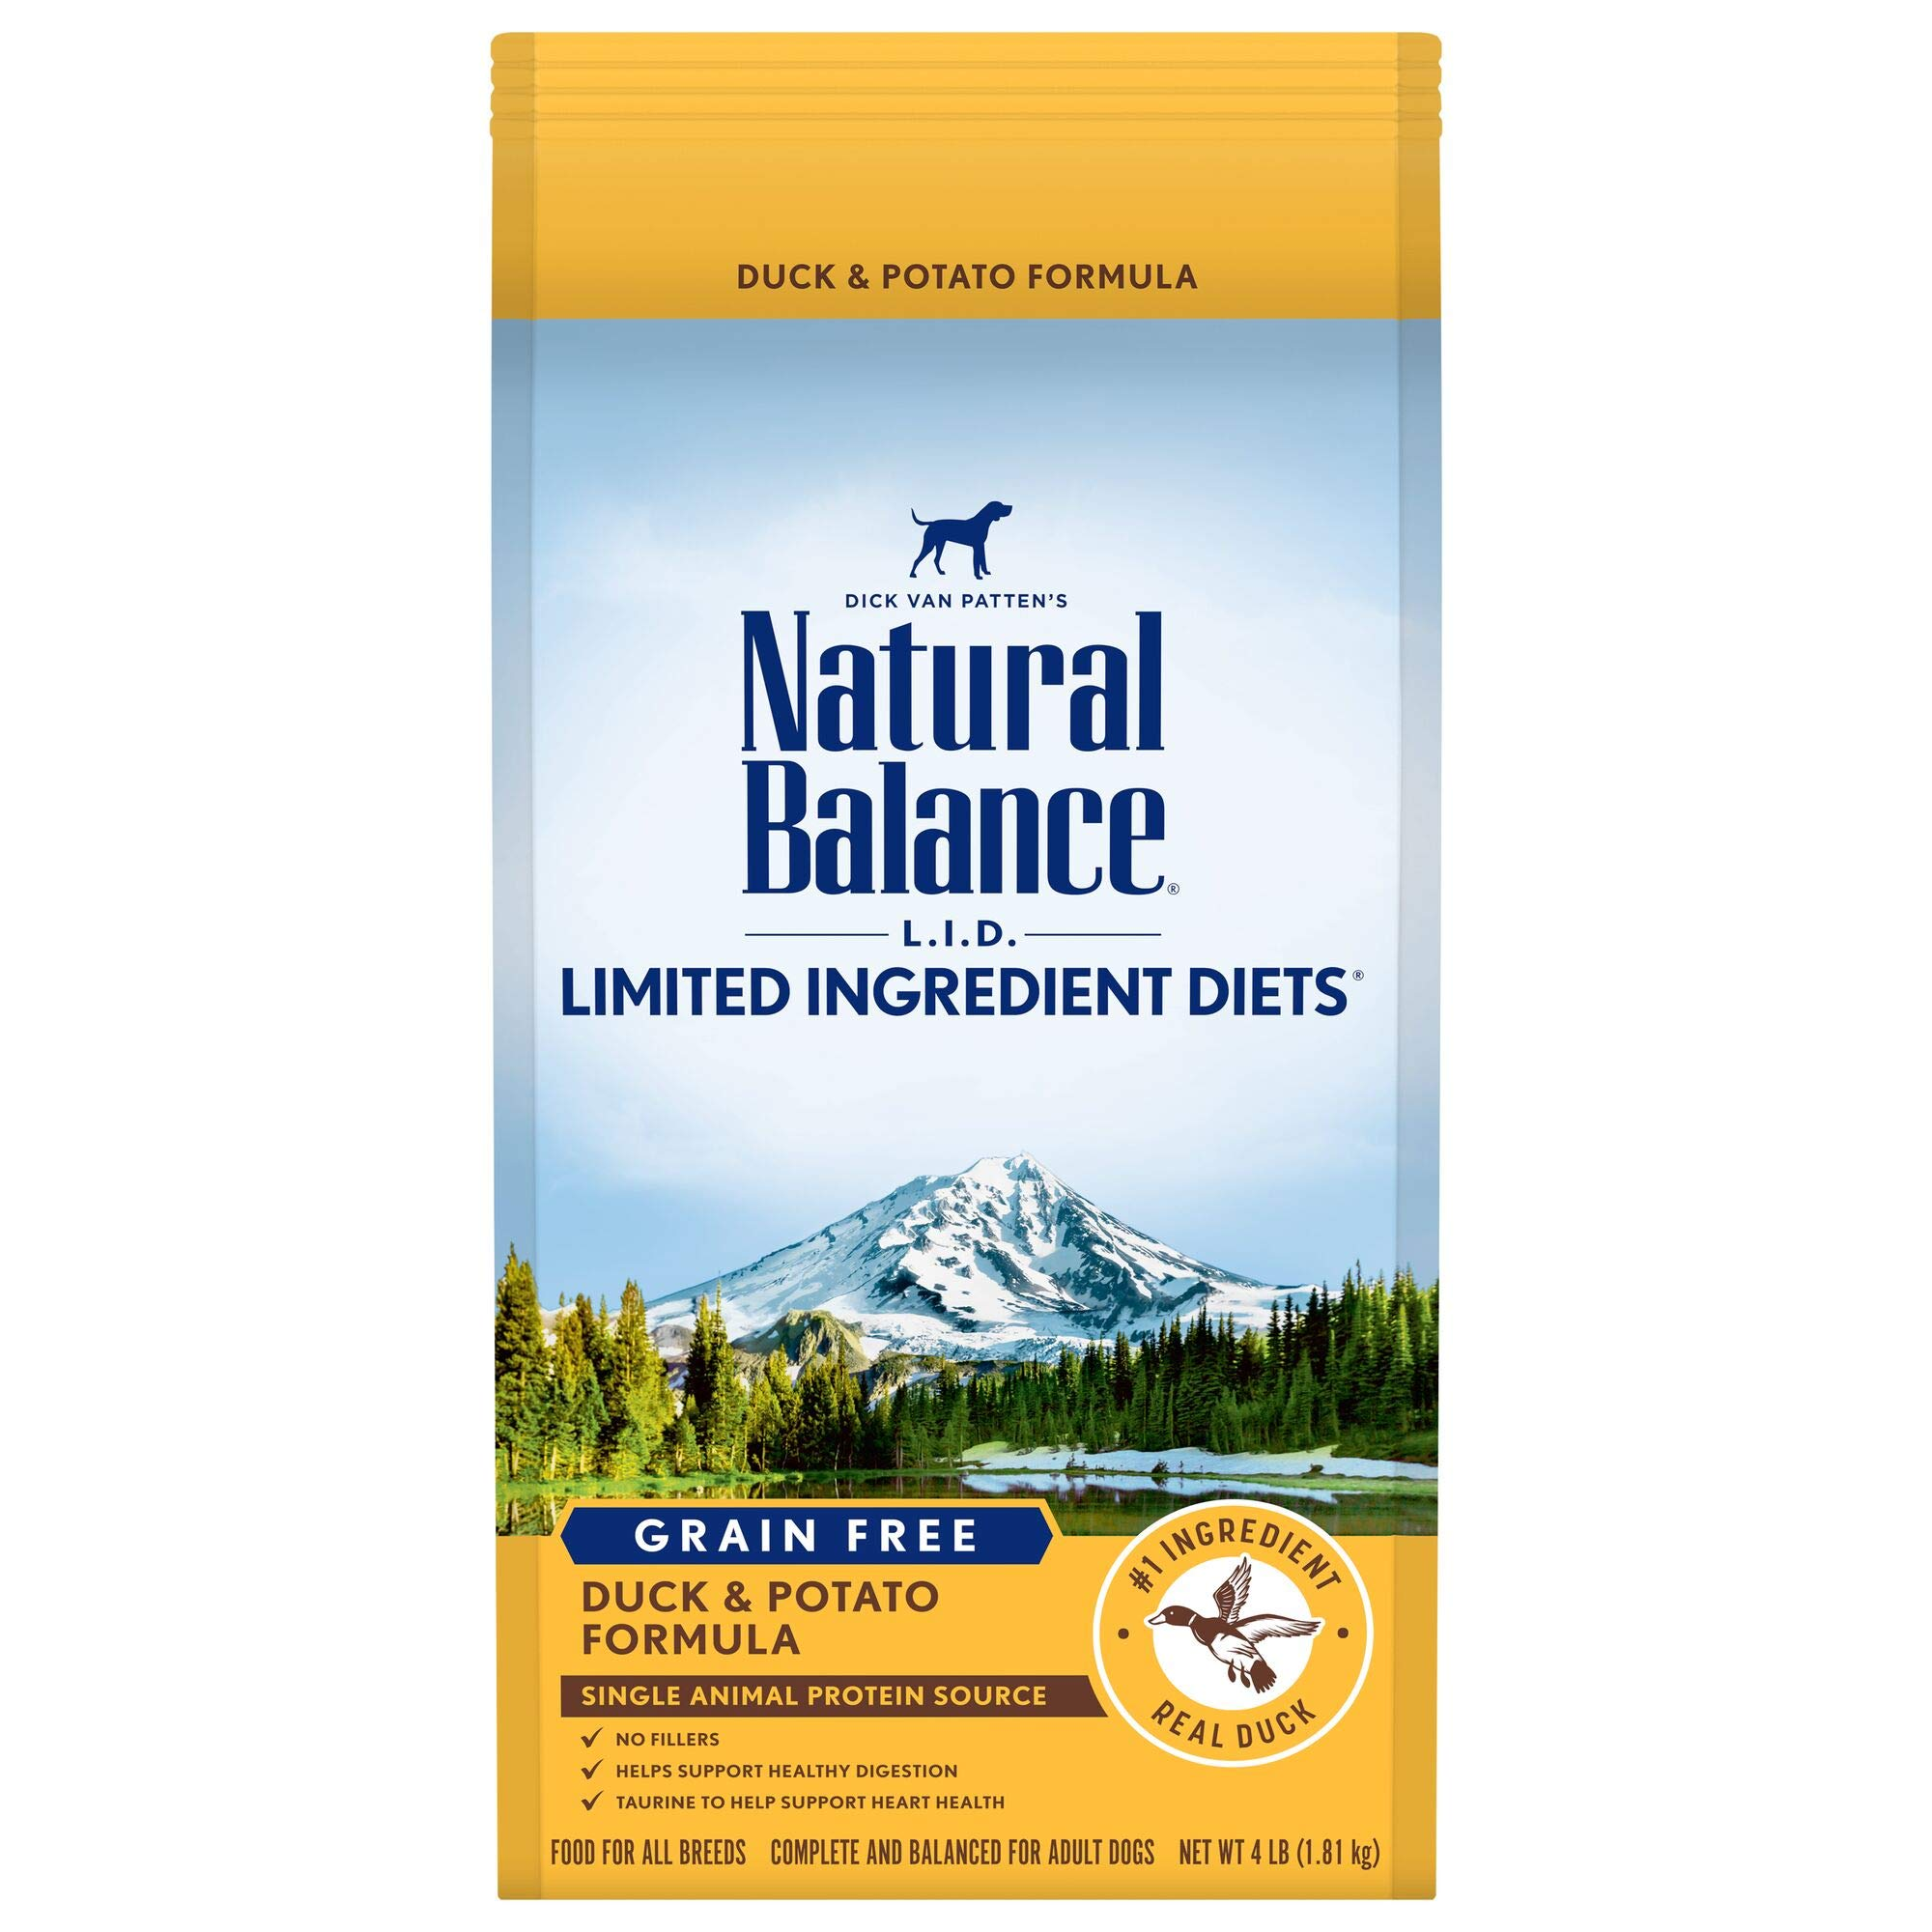 Natural Balance L.I.D. Limited Ingredient Diets Grain-Free Dry Dog Food, Duck & Potato, 4-lb bag